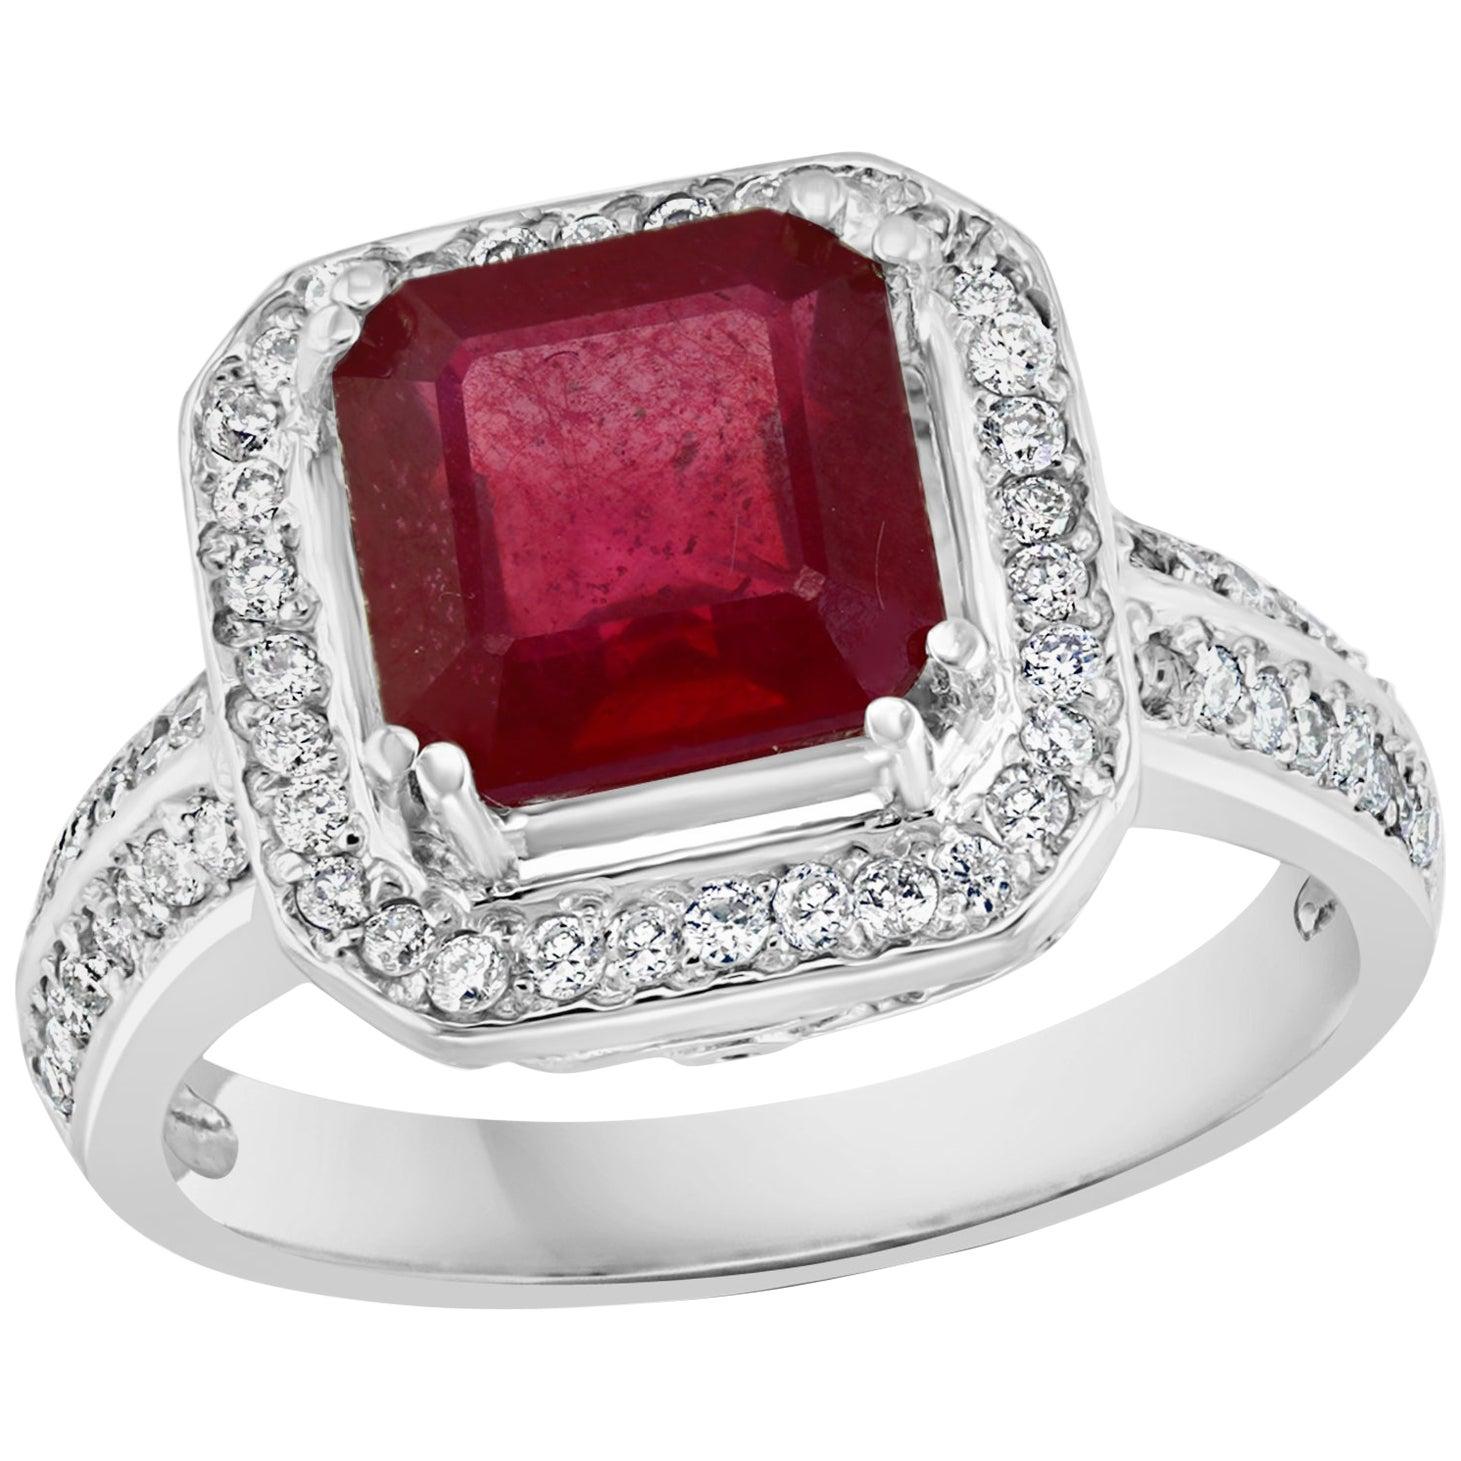 3 Carat Square Treated Ruby and Diamond 14 Karat White Gold Ring